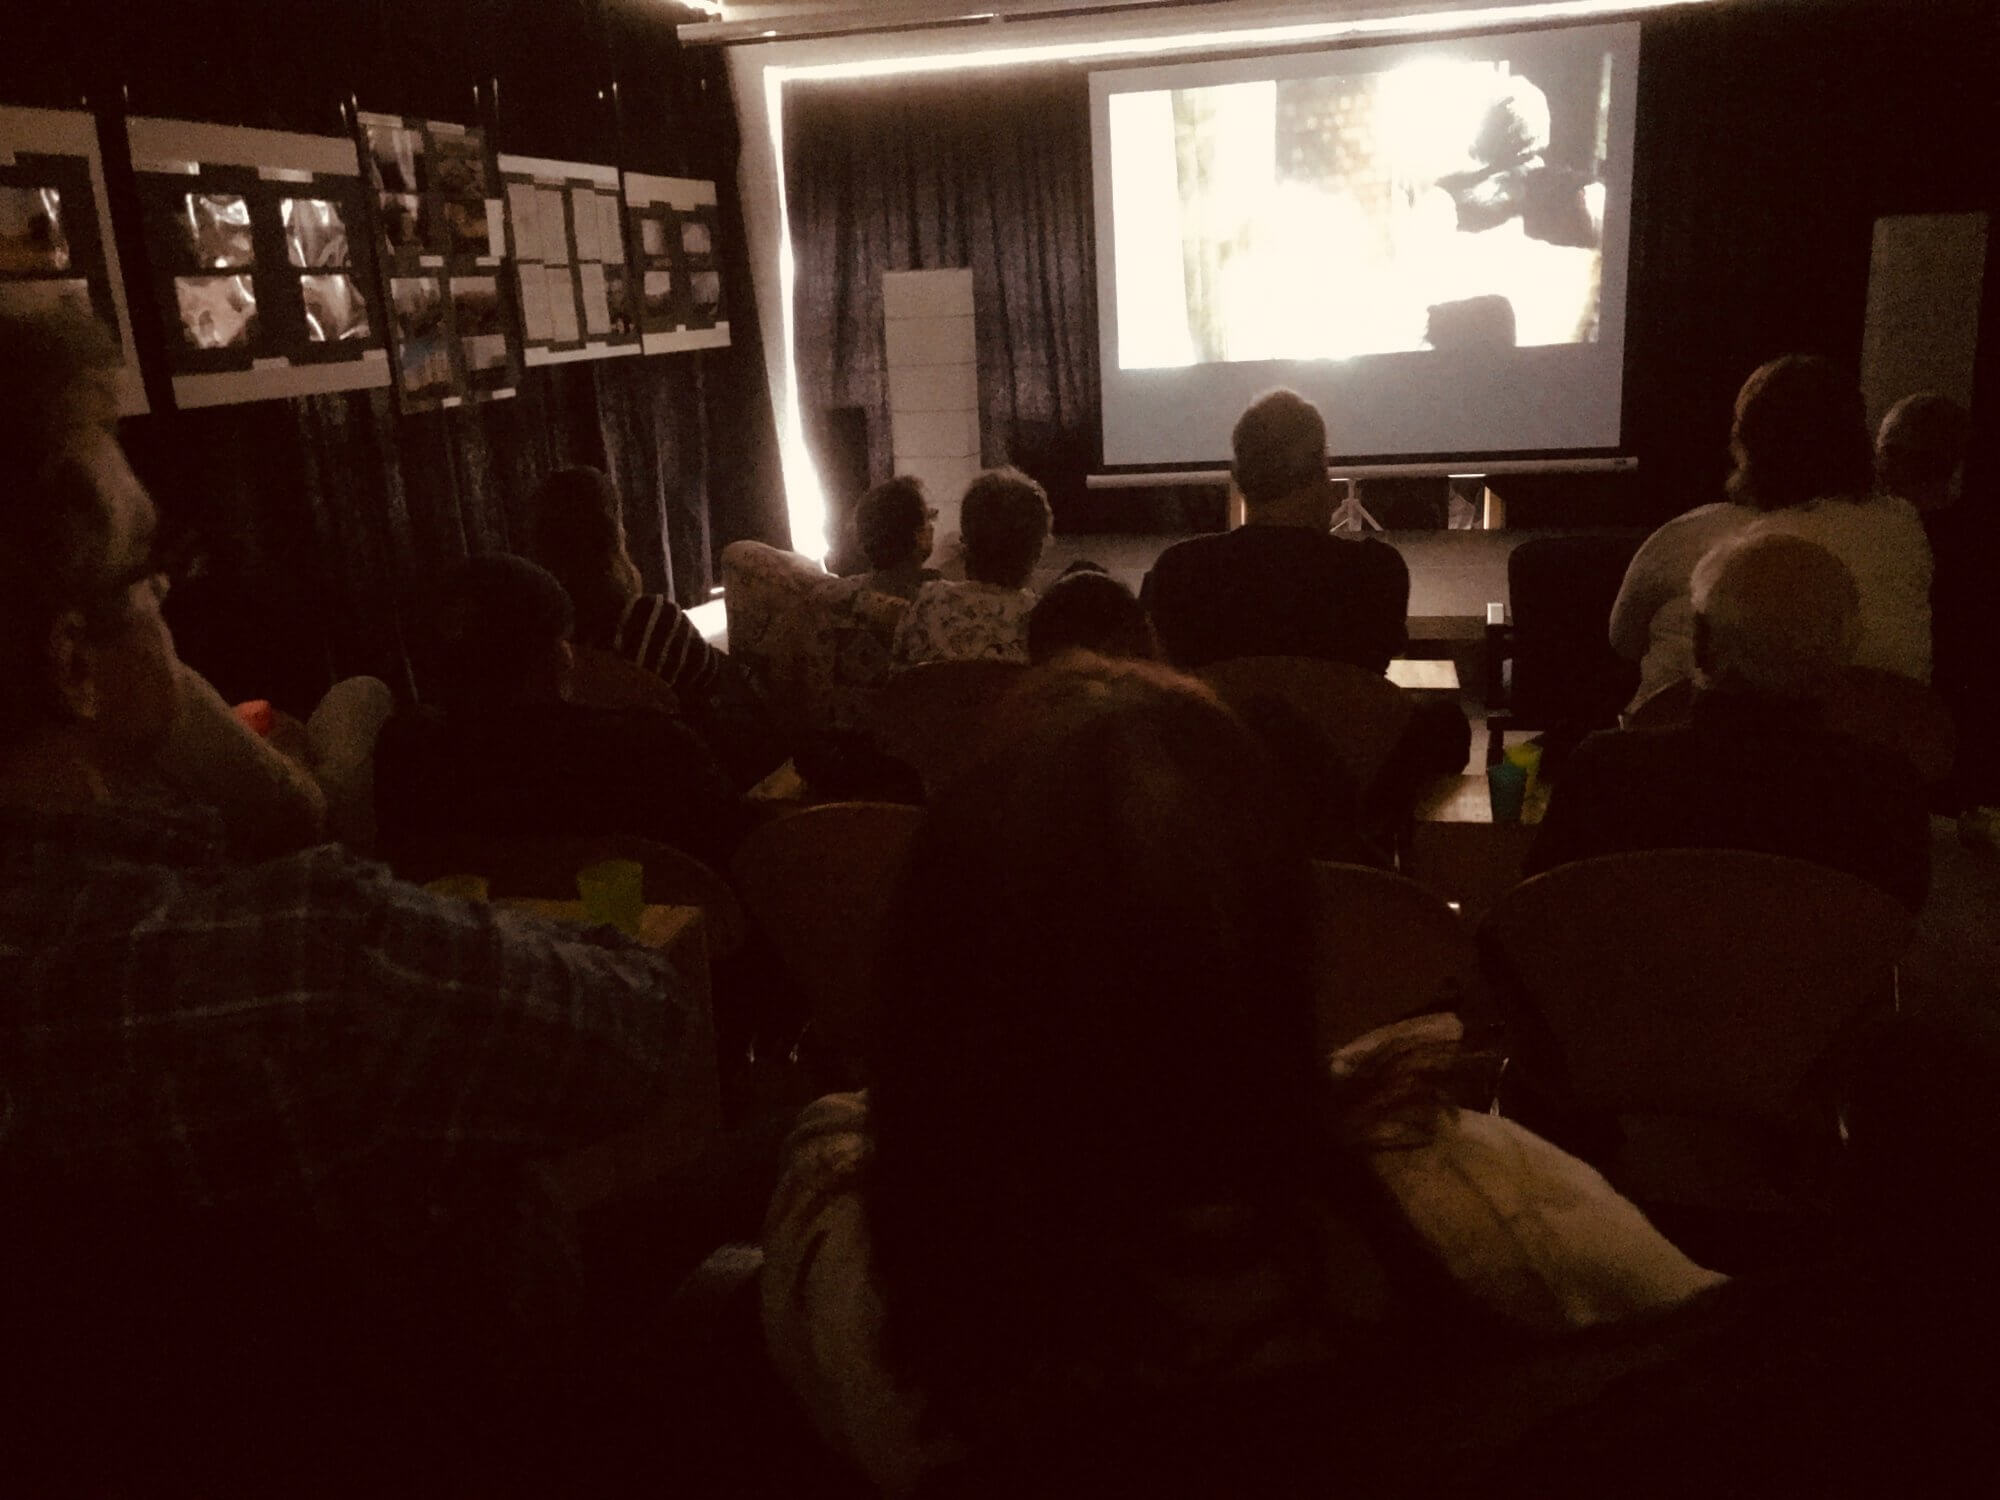 Kino in Altglienicke - Berlin Treptow - Kosmosviertel -